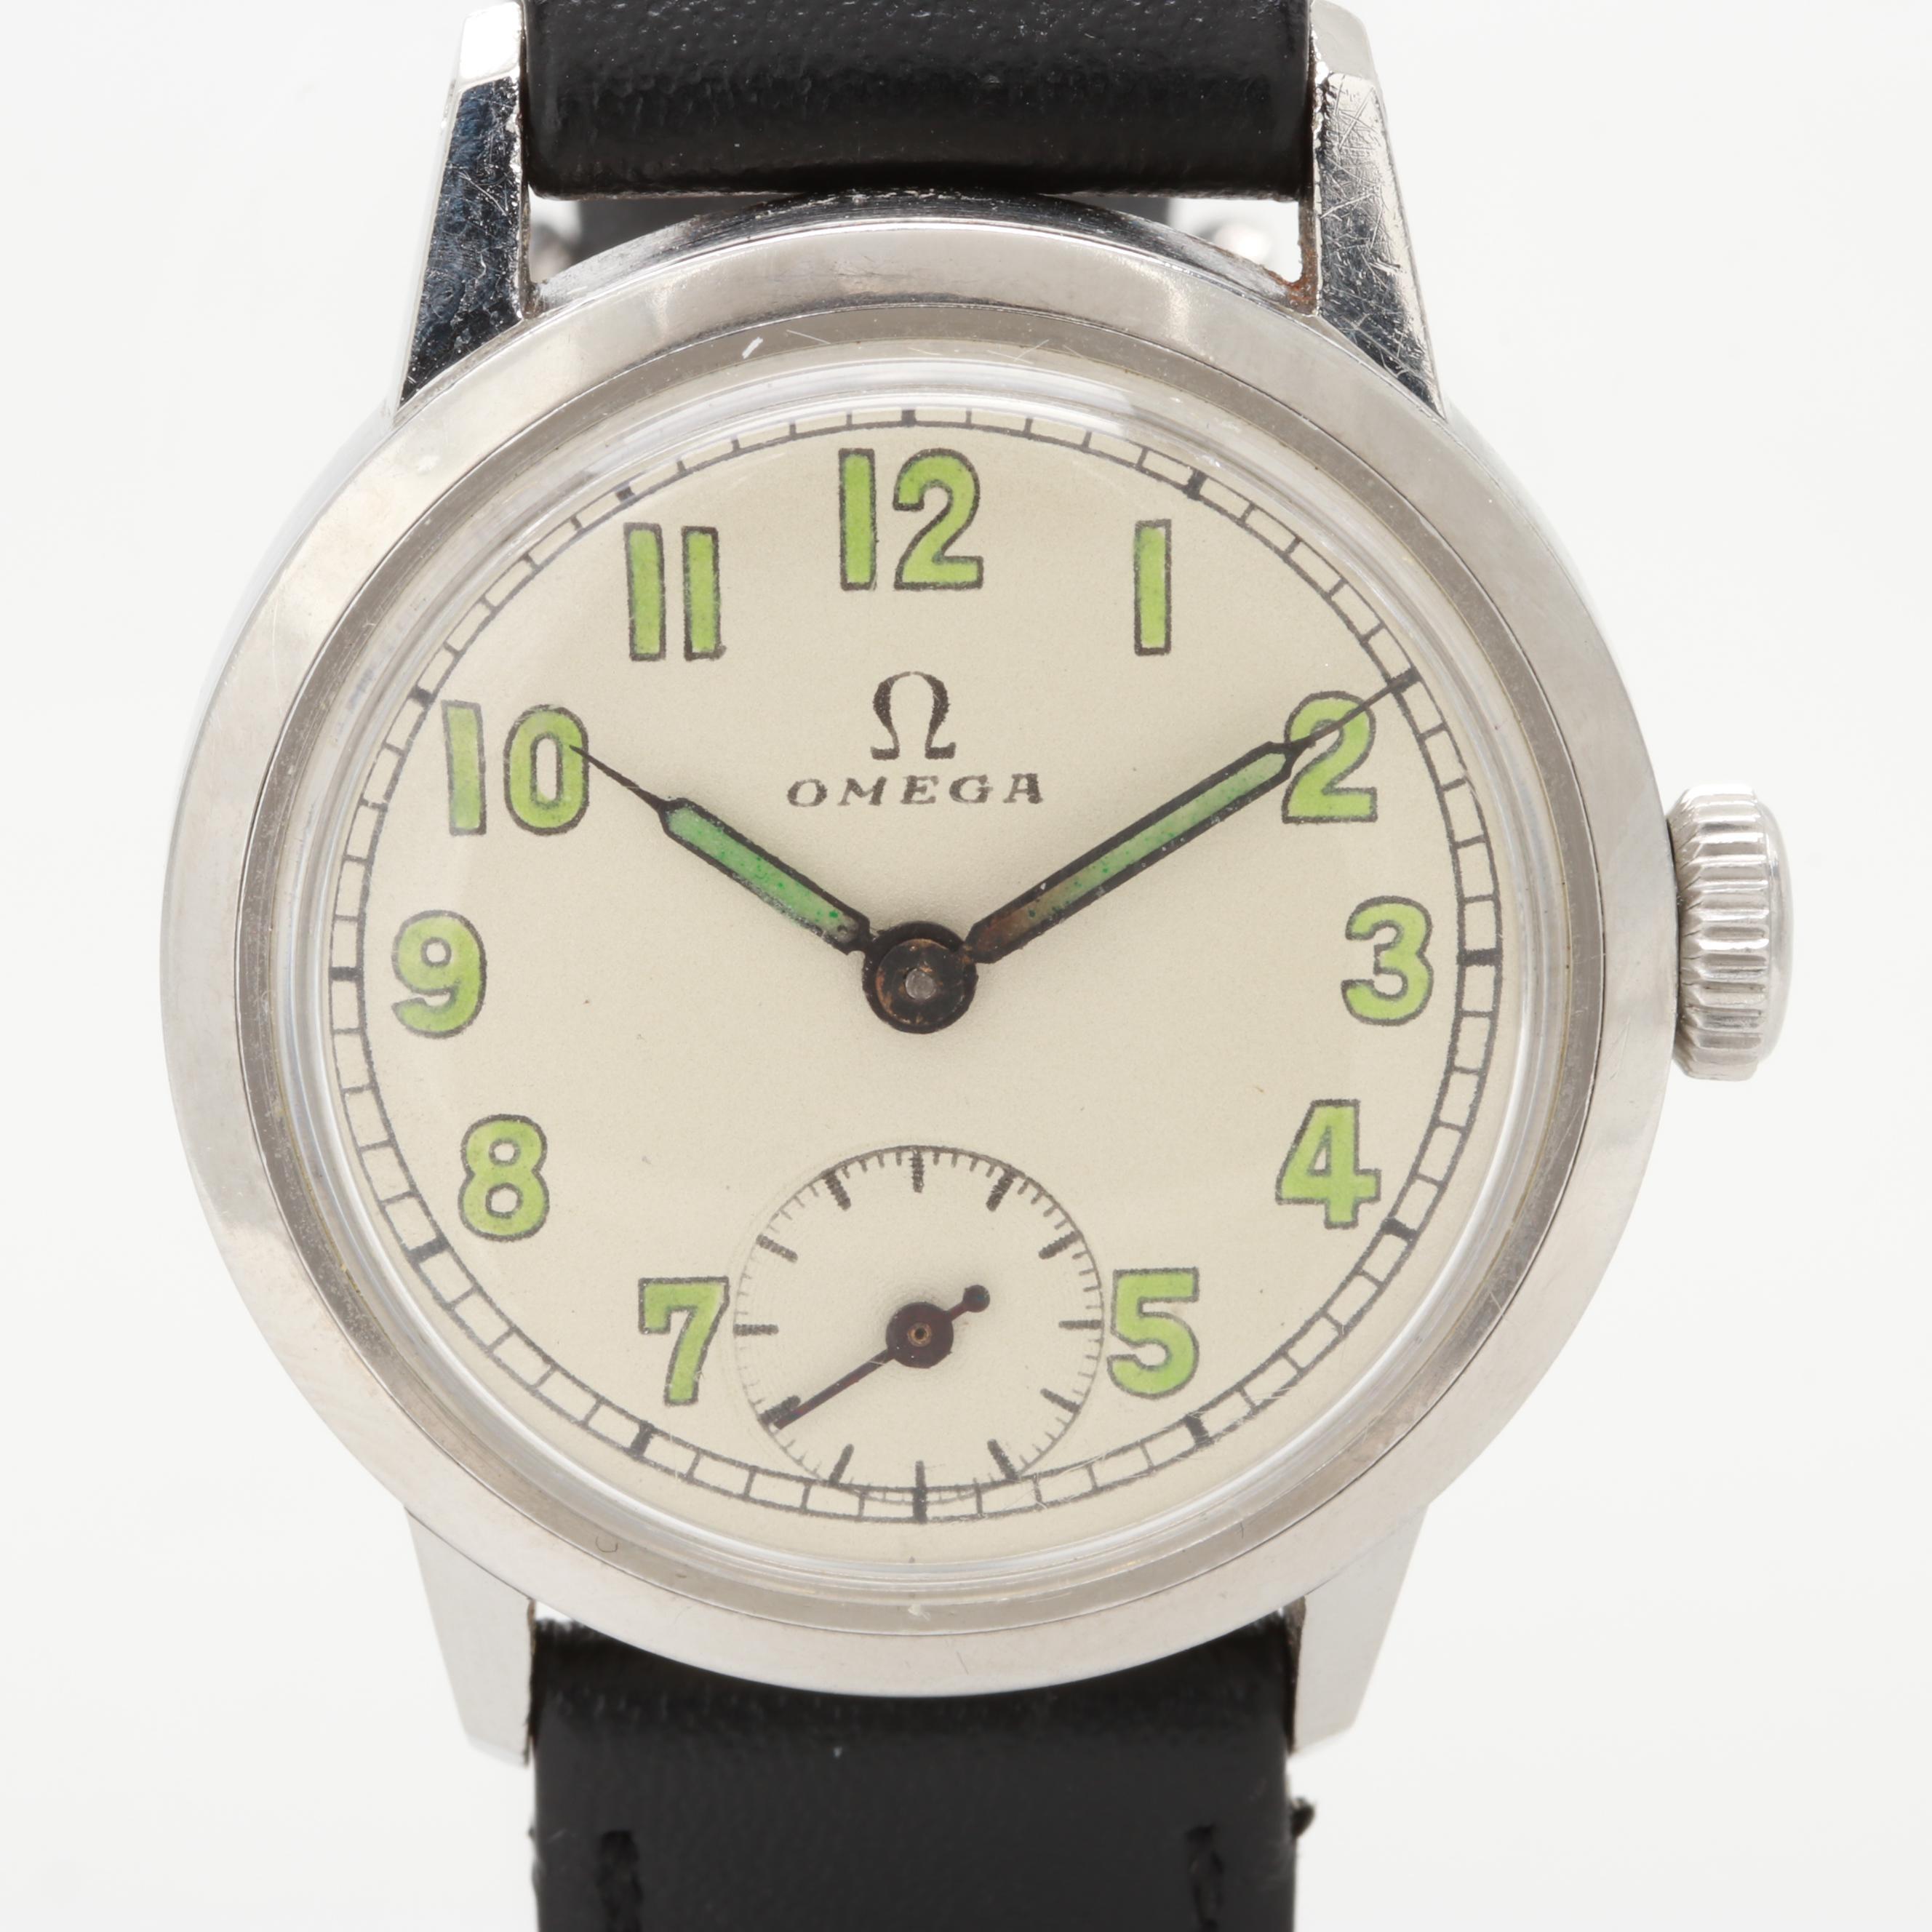 Vintage Omega Stainless Steel Stem Wind Wristwatch